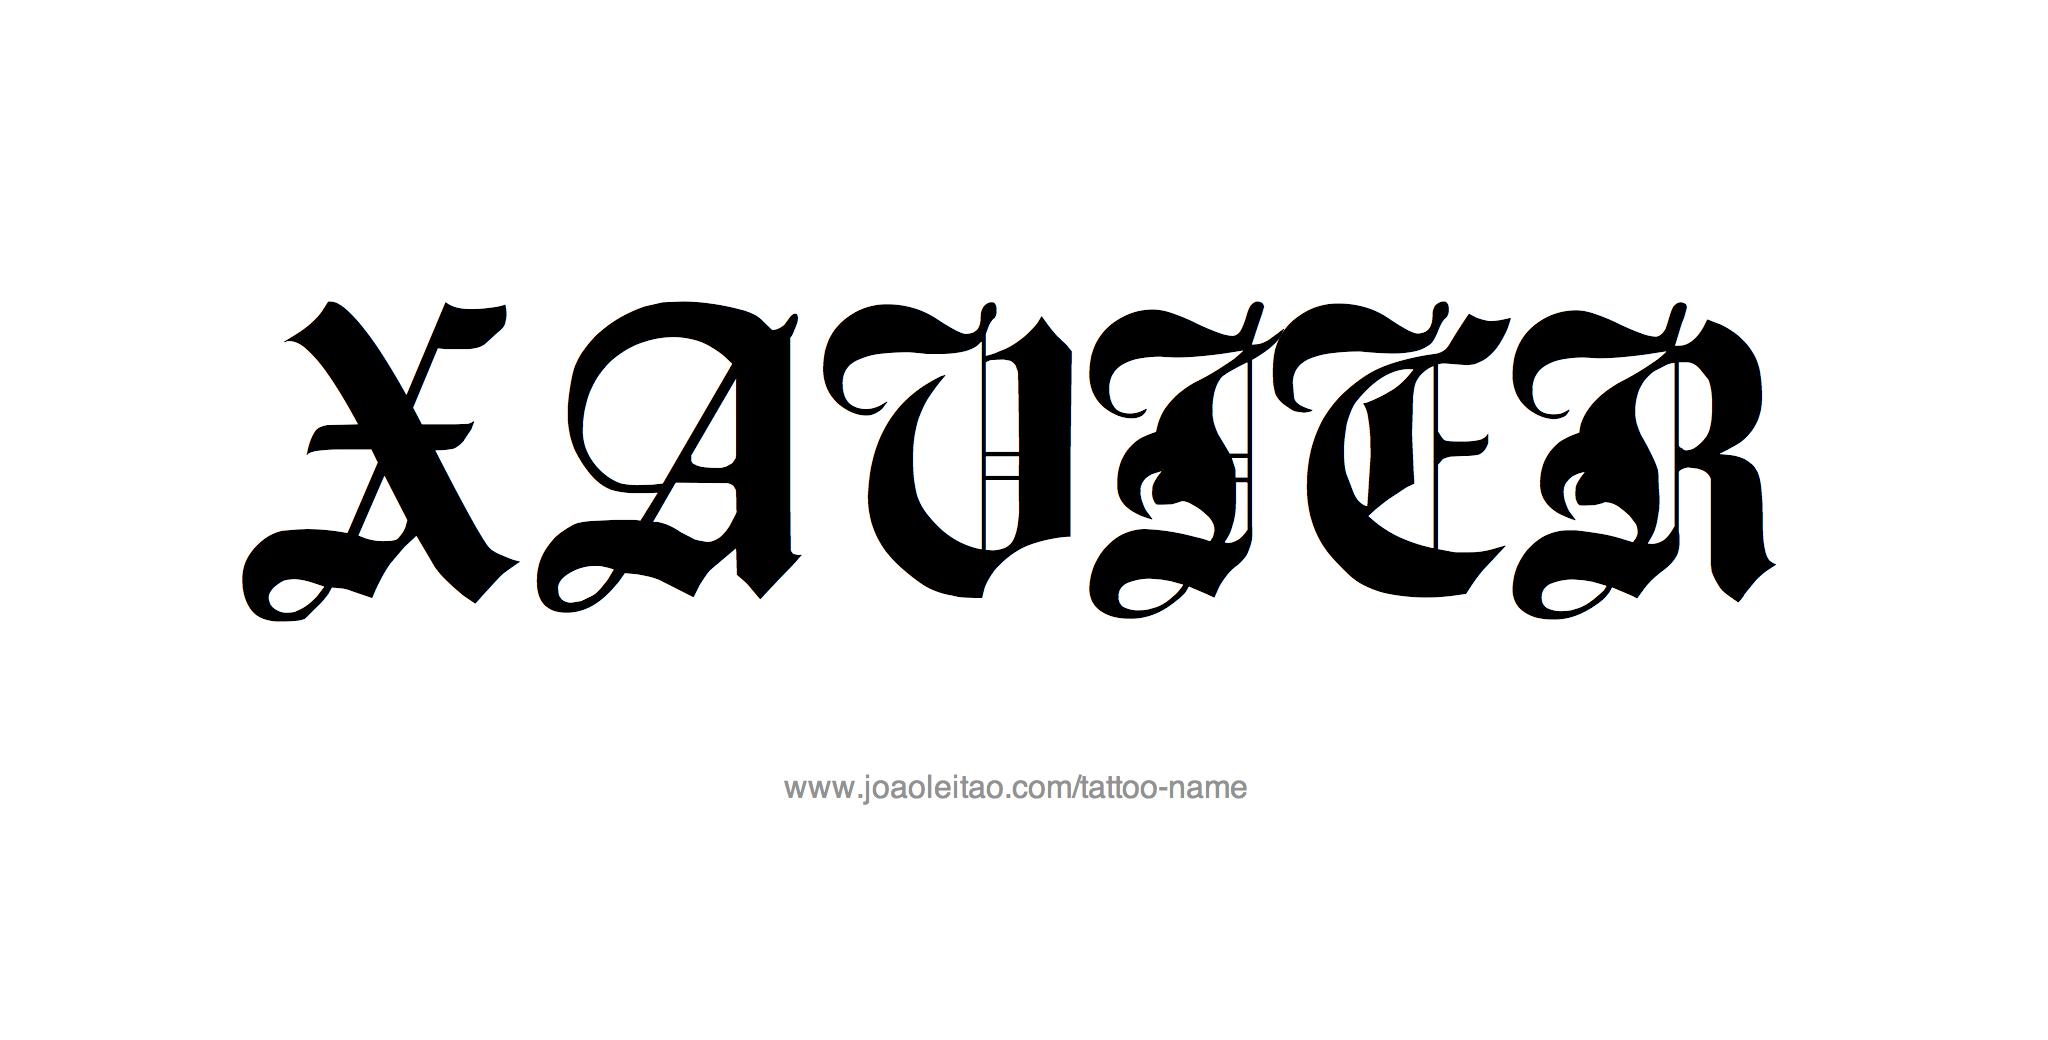 Xavier Name Tattoo Designs Name Tattoo Designs Name Tattoo Name Tattoos